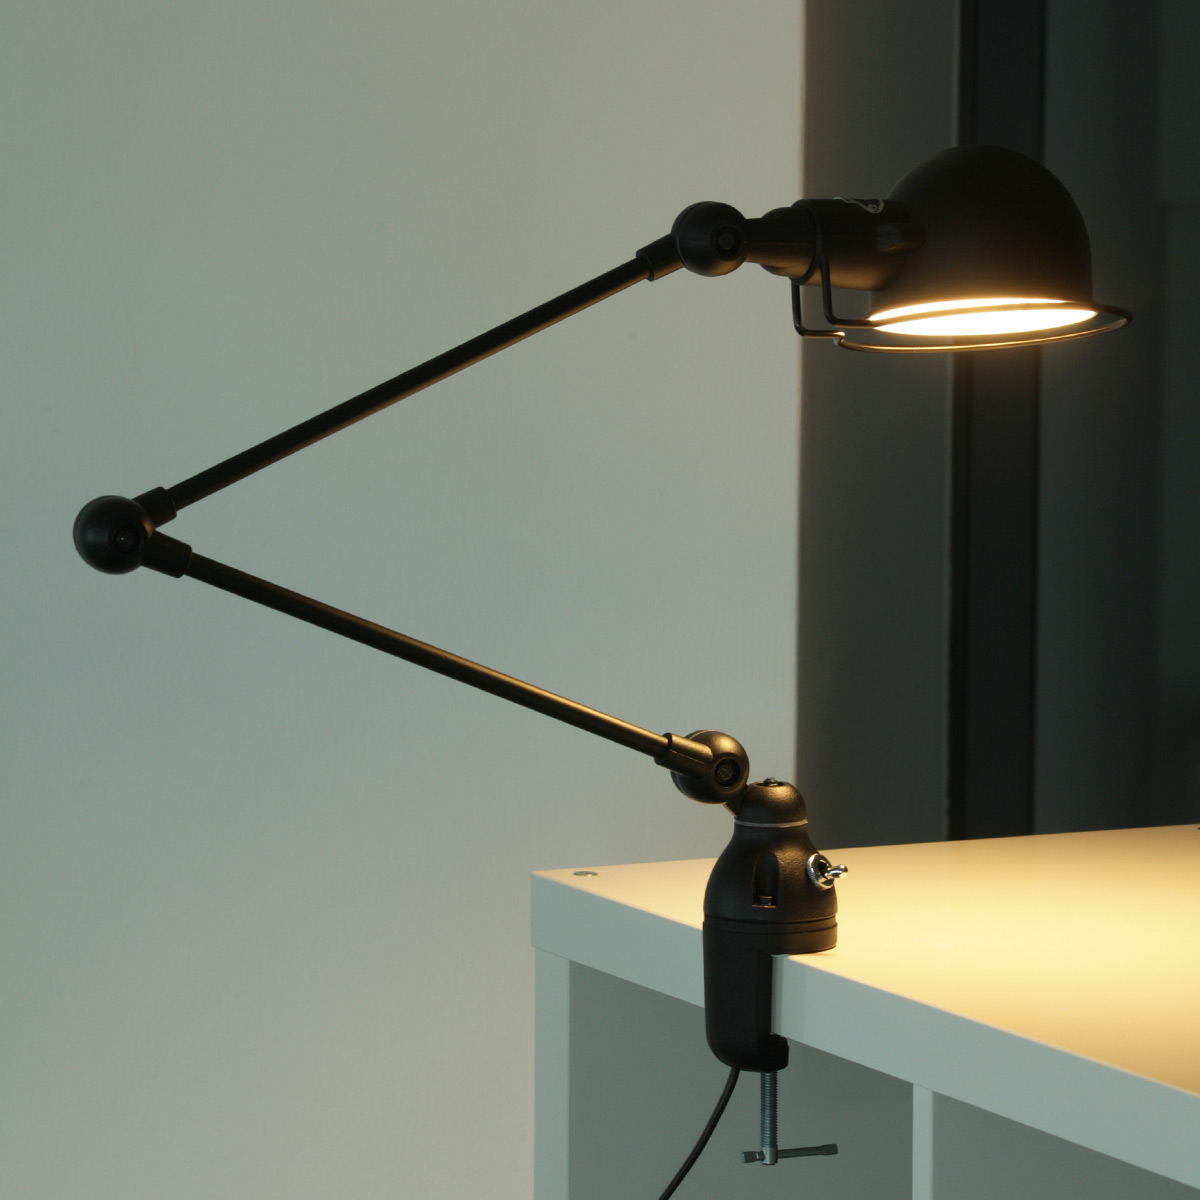 Klemm lampe signal f r tischplatten und regale casa lumi for Design tischplatten